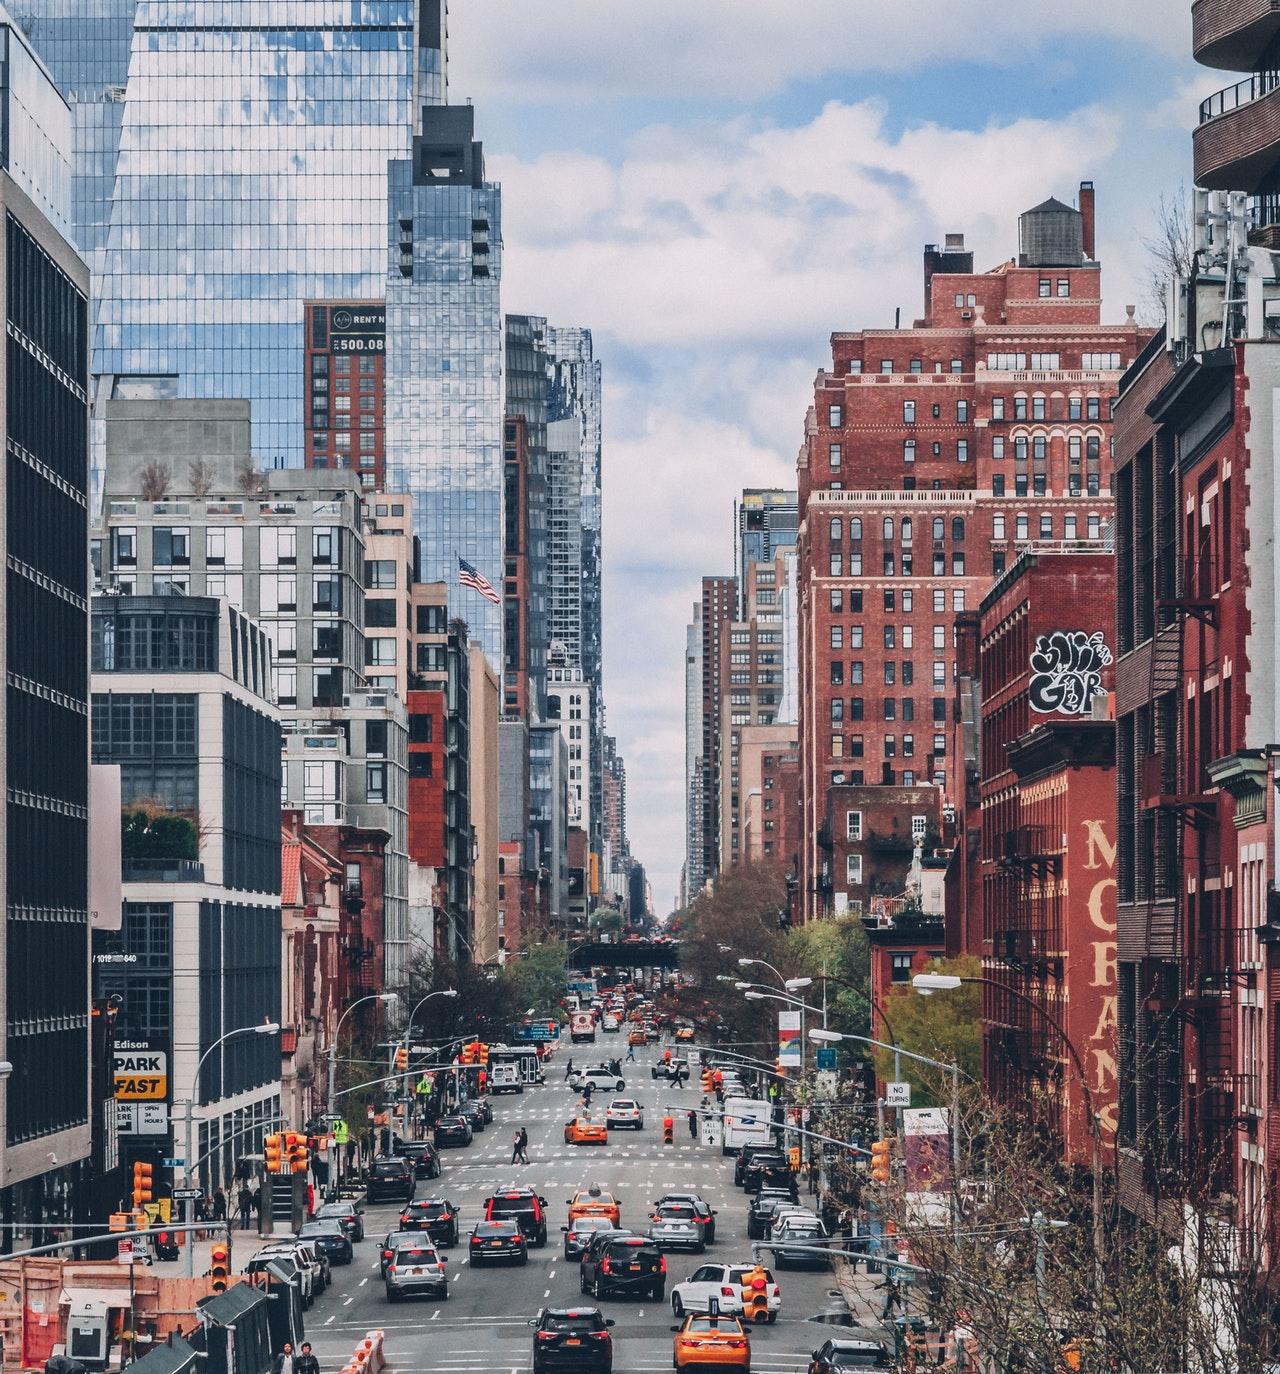 traffic in a city